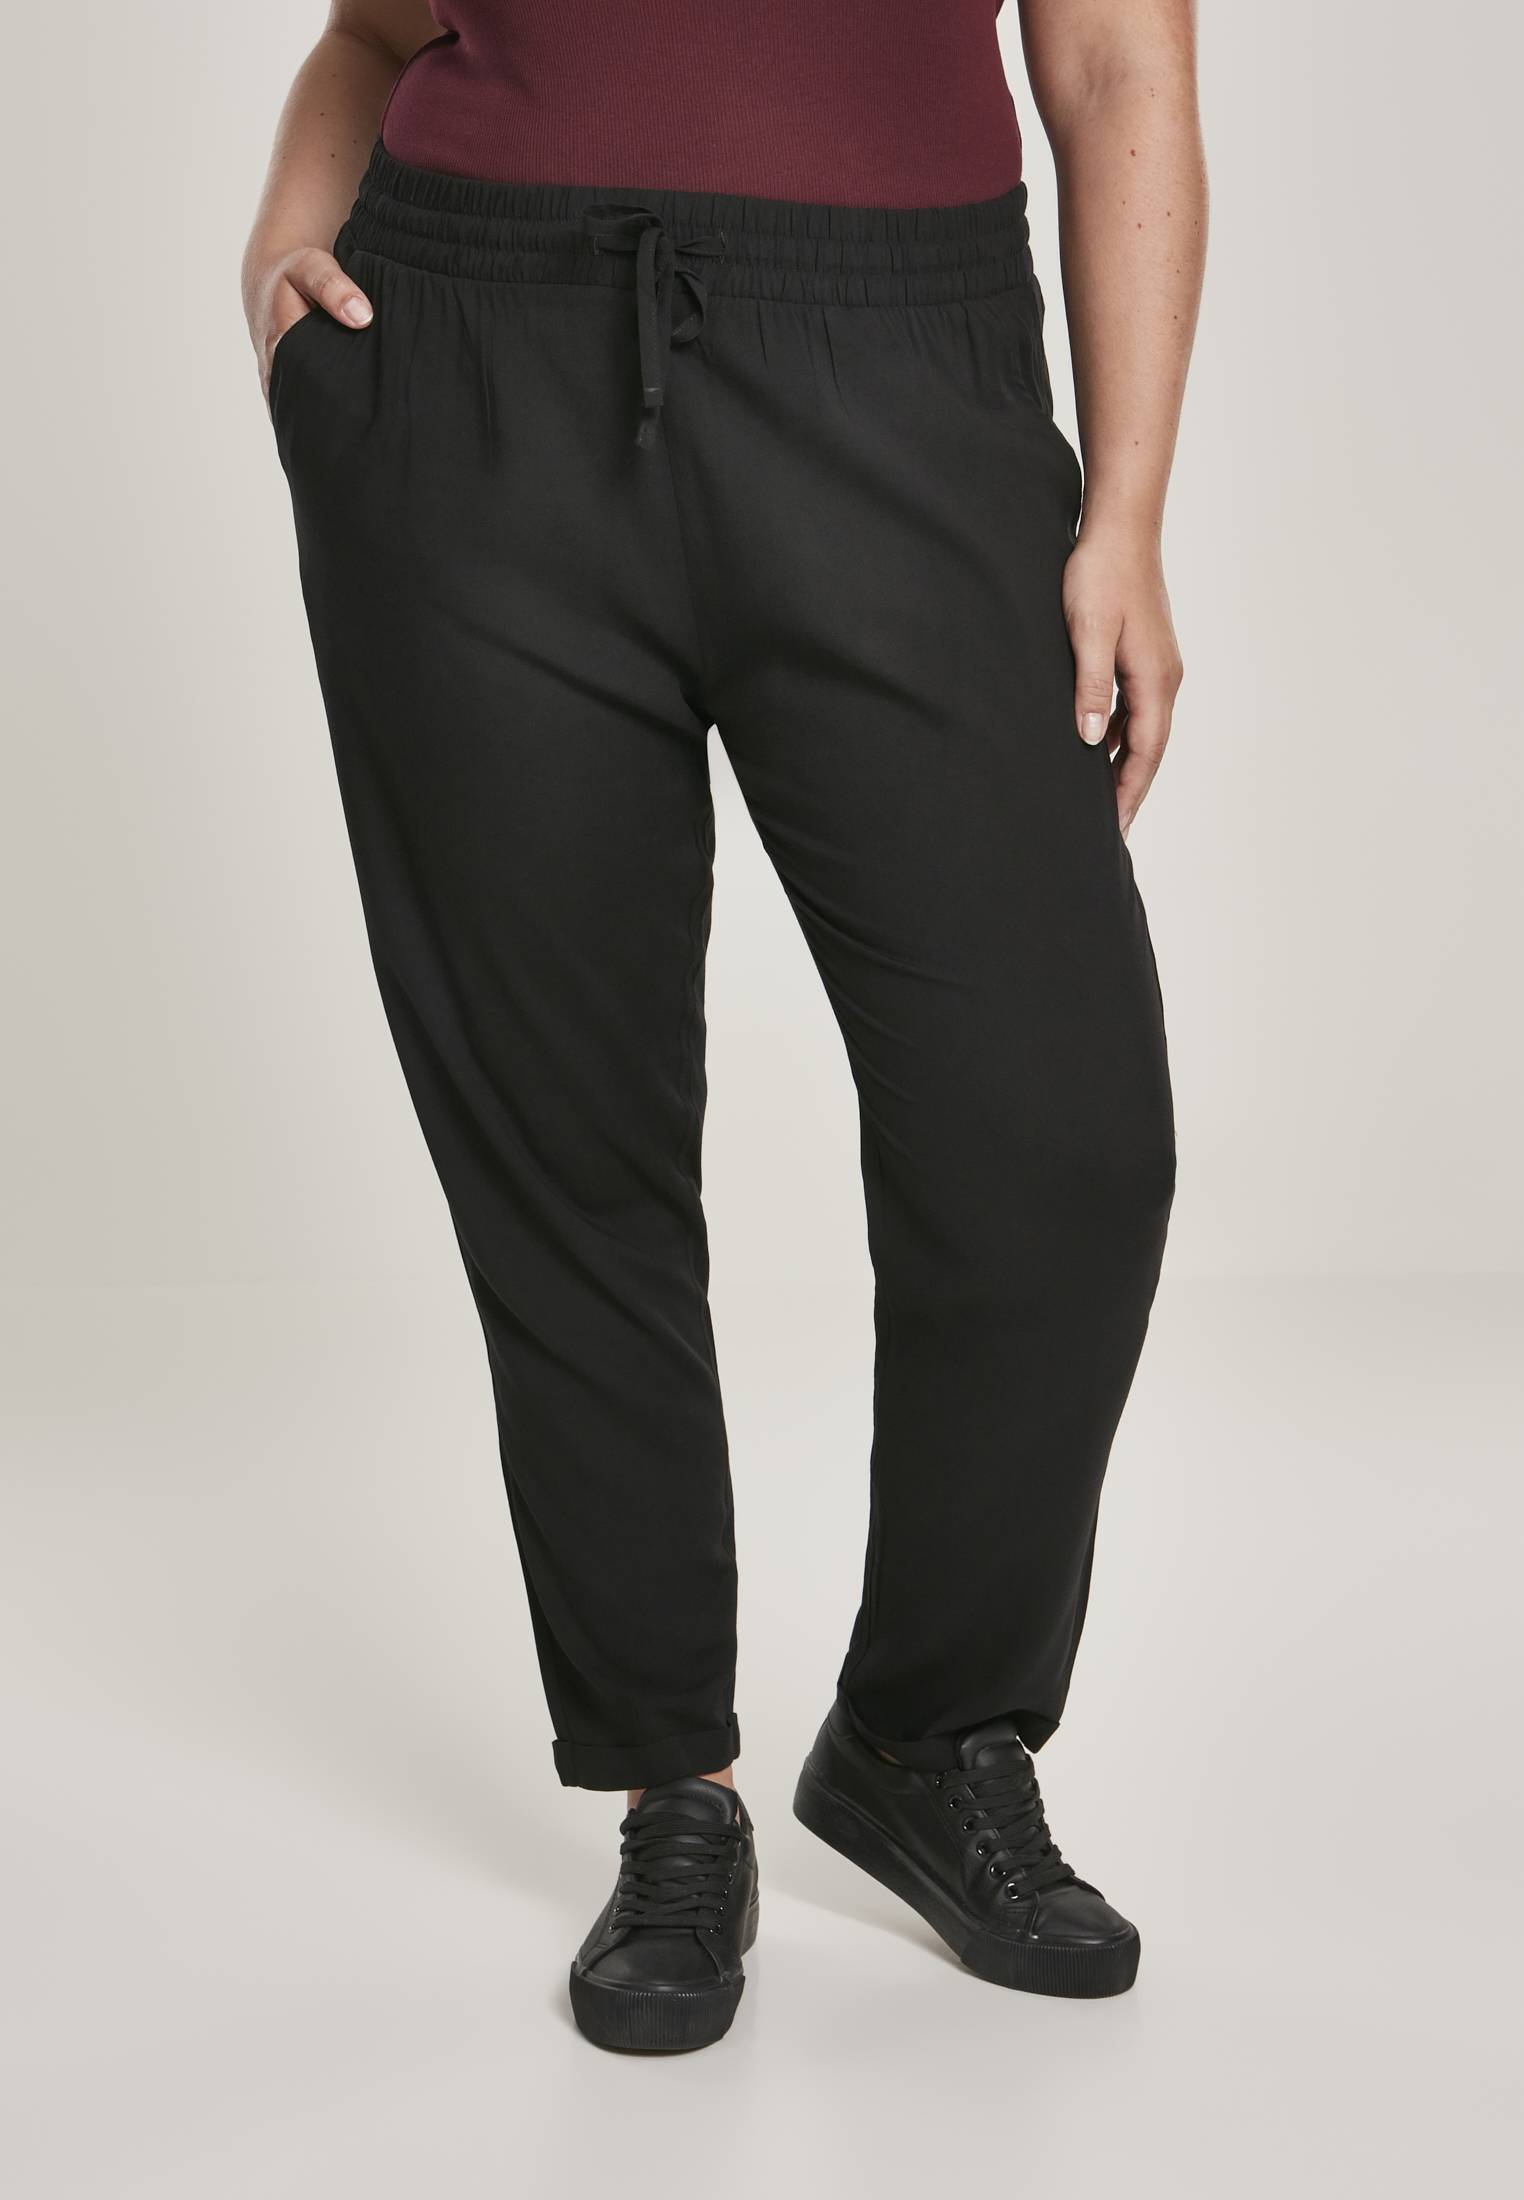 Urban Classics Ladies Elastic Waist Pants black - 5XL